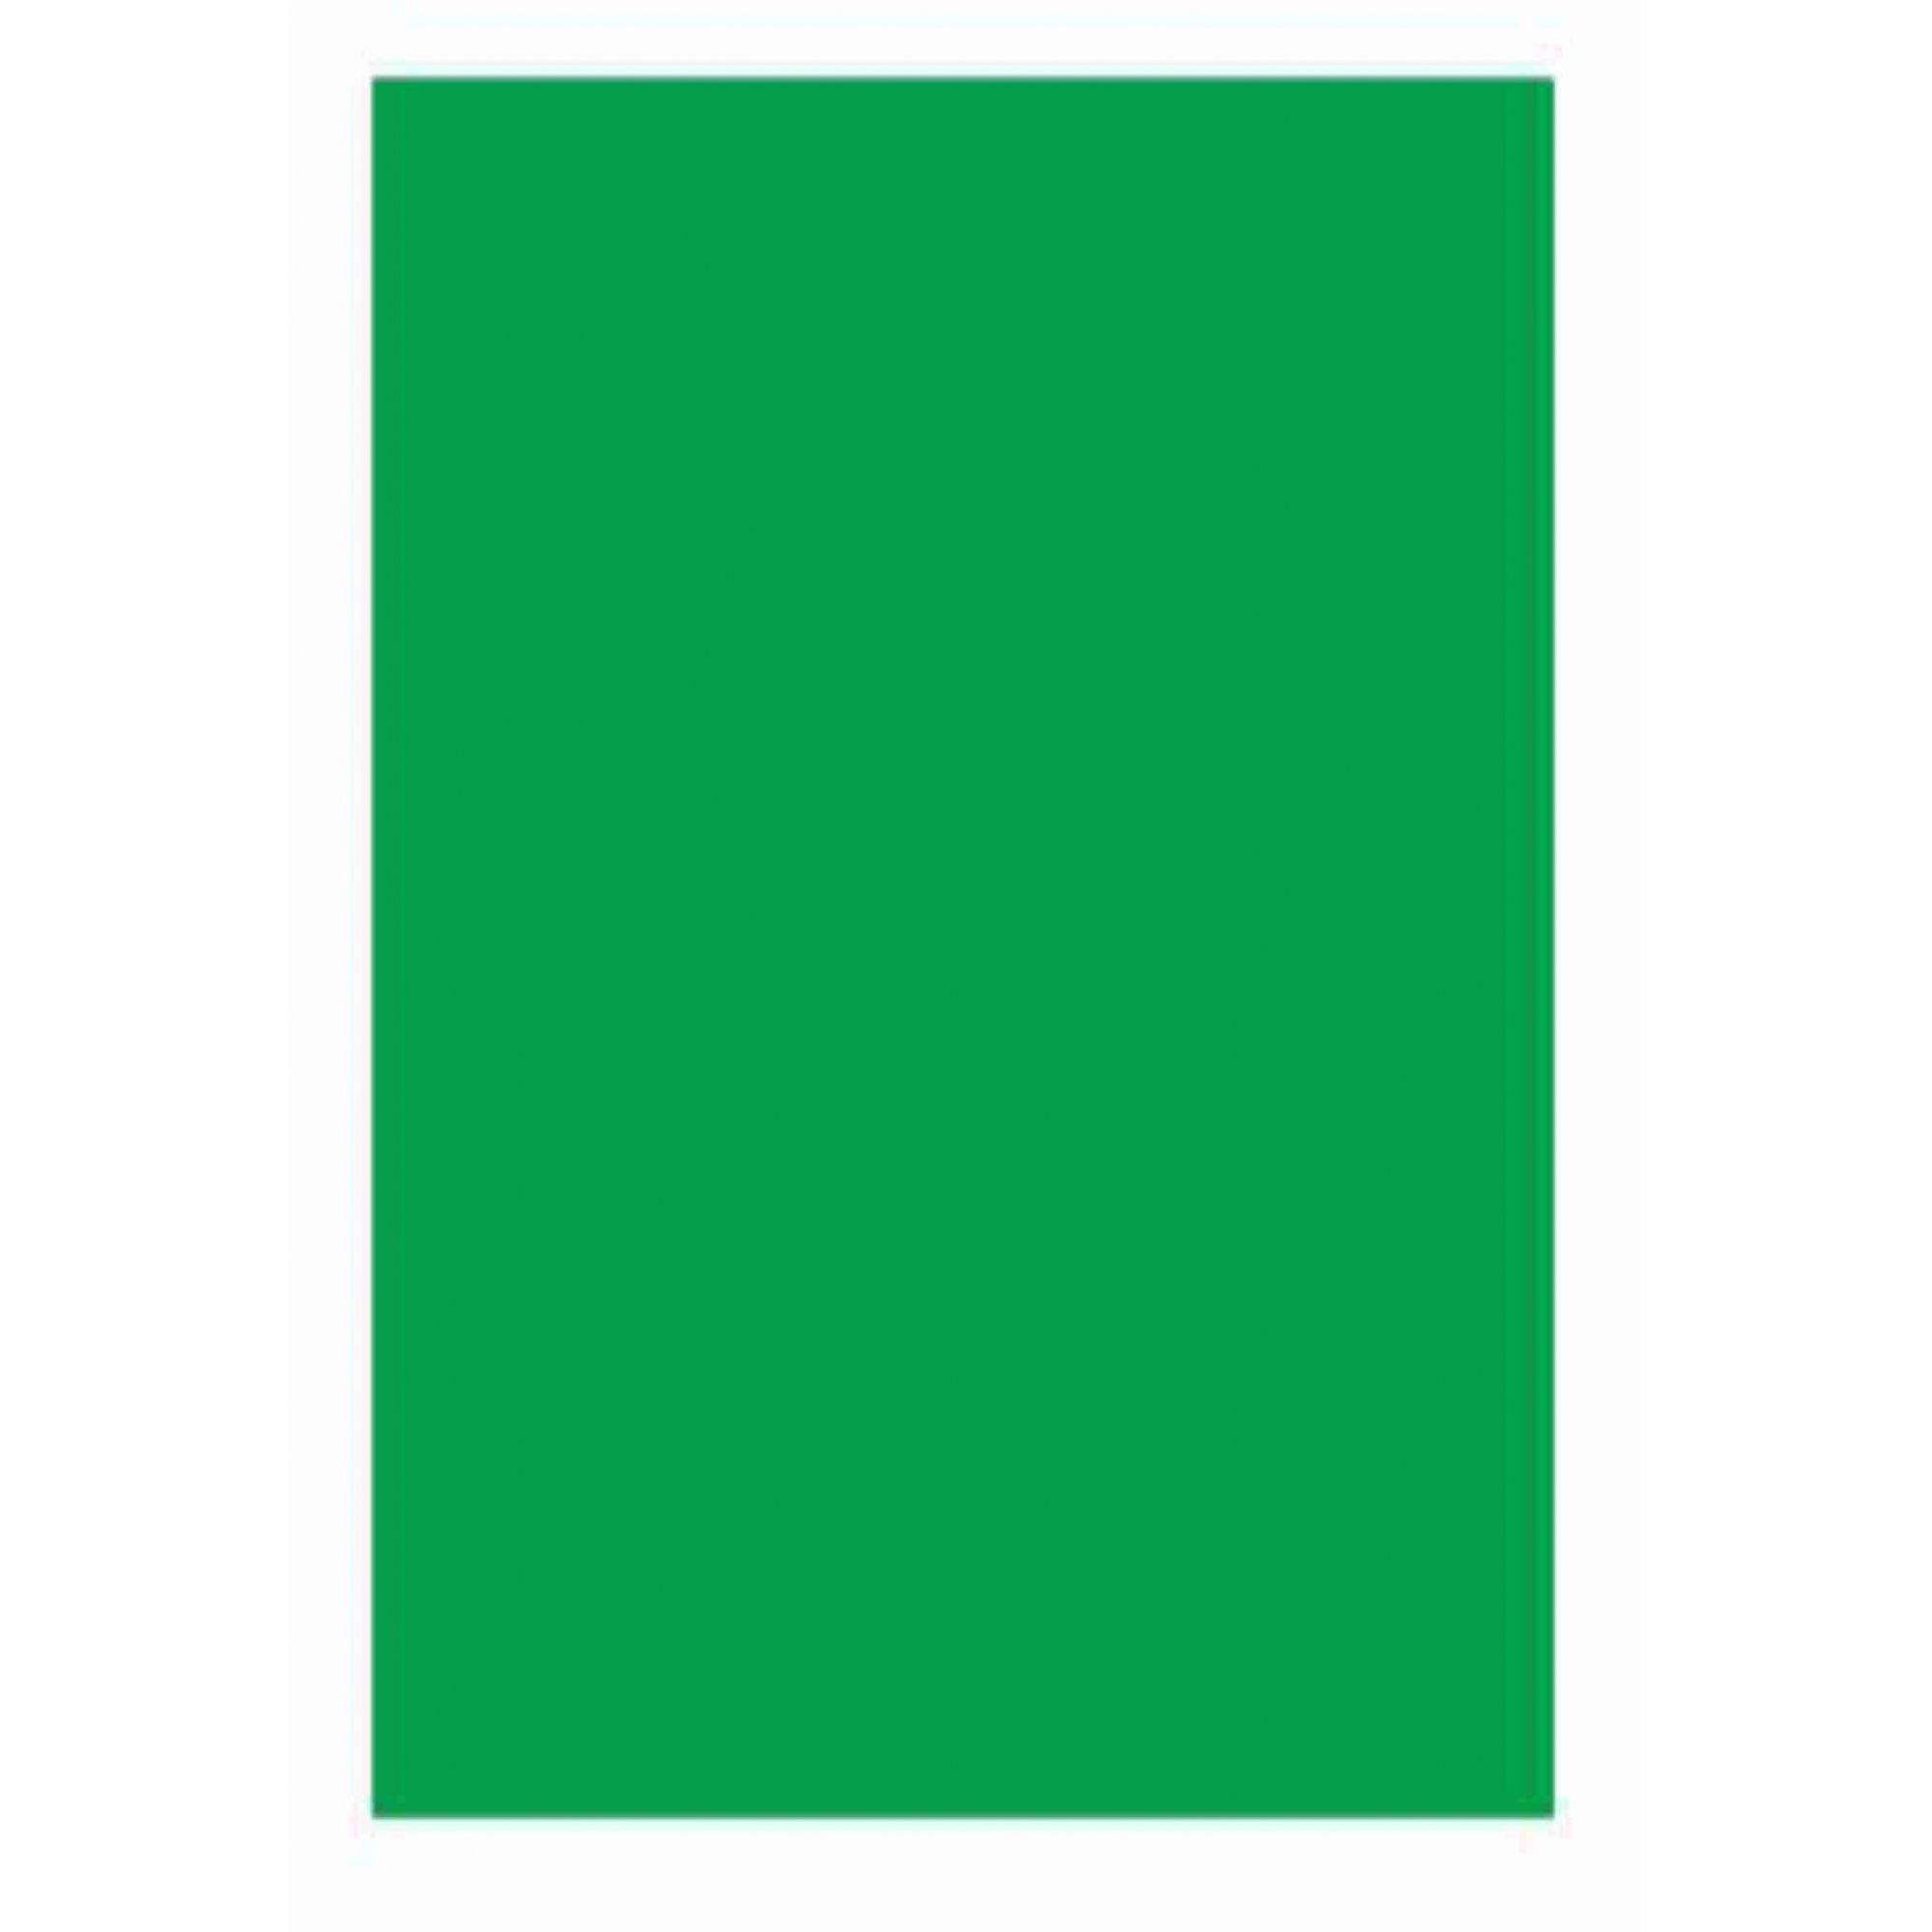 Folha Colorida Verde EV14101 - Vidro